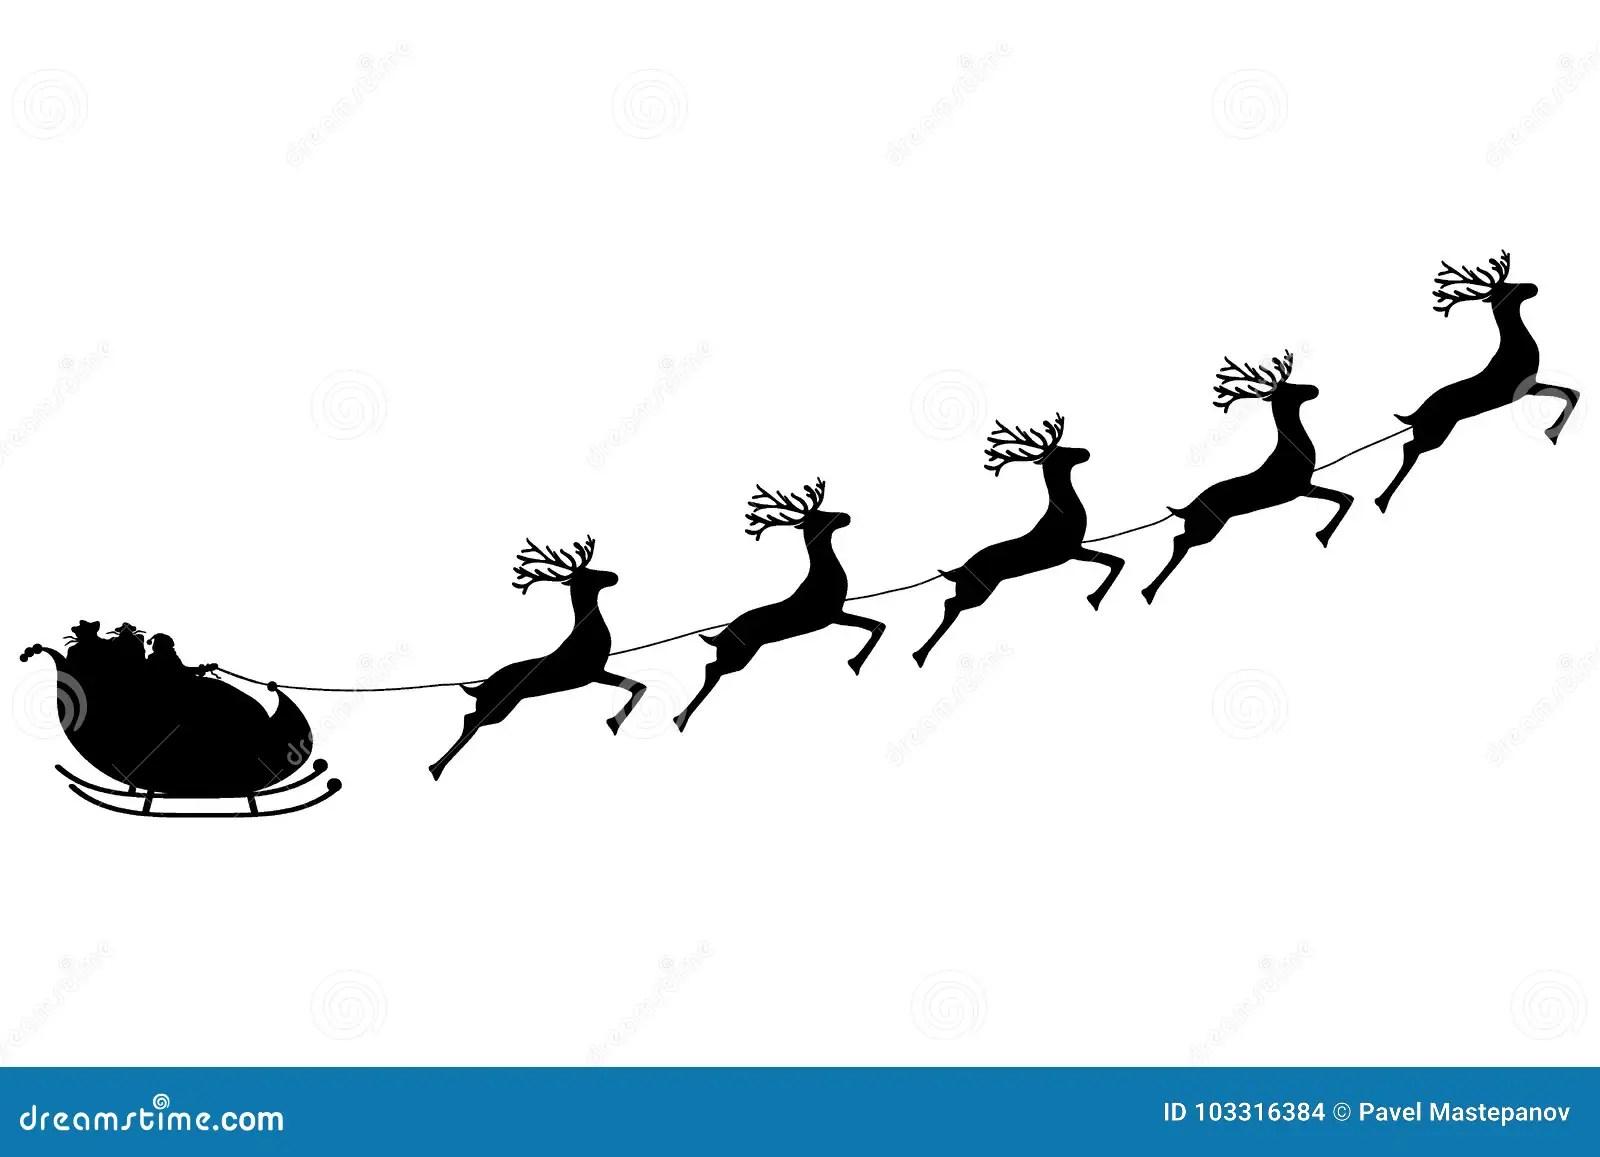 Reindeer Sled Harness